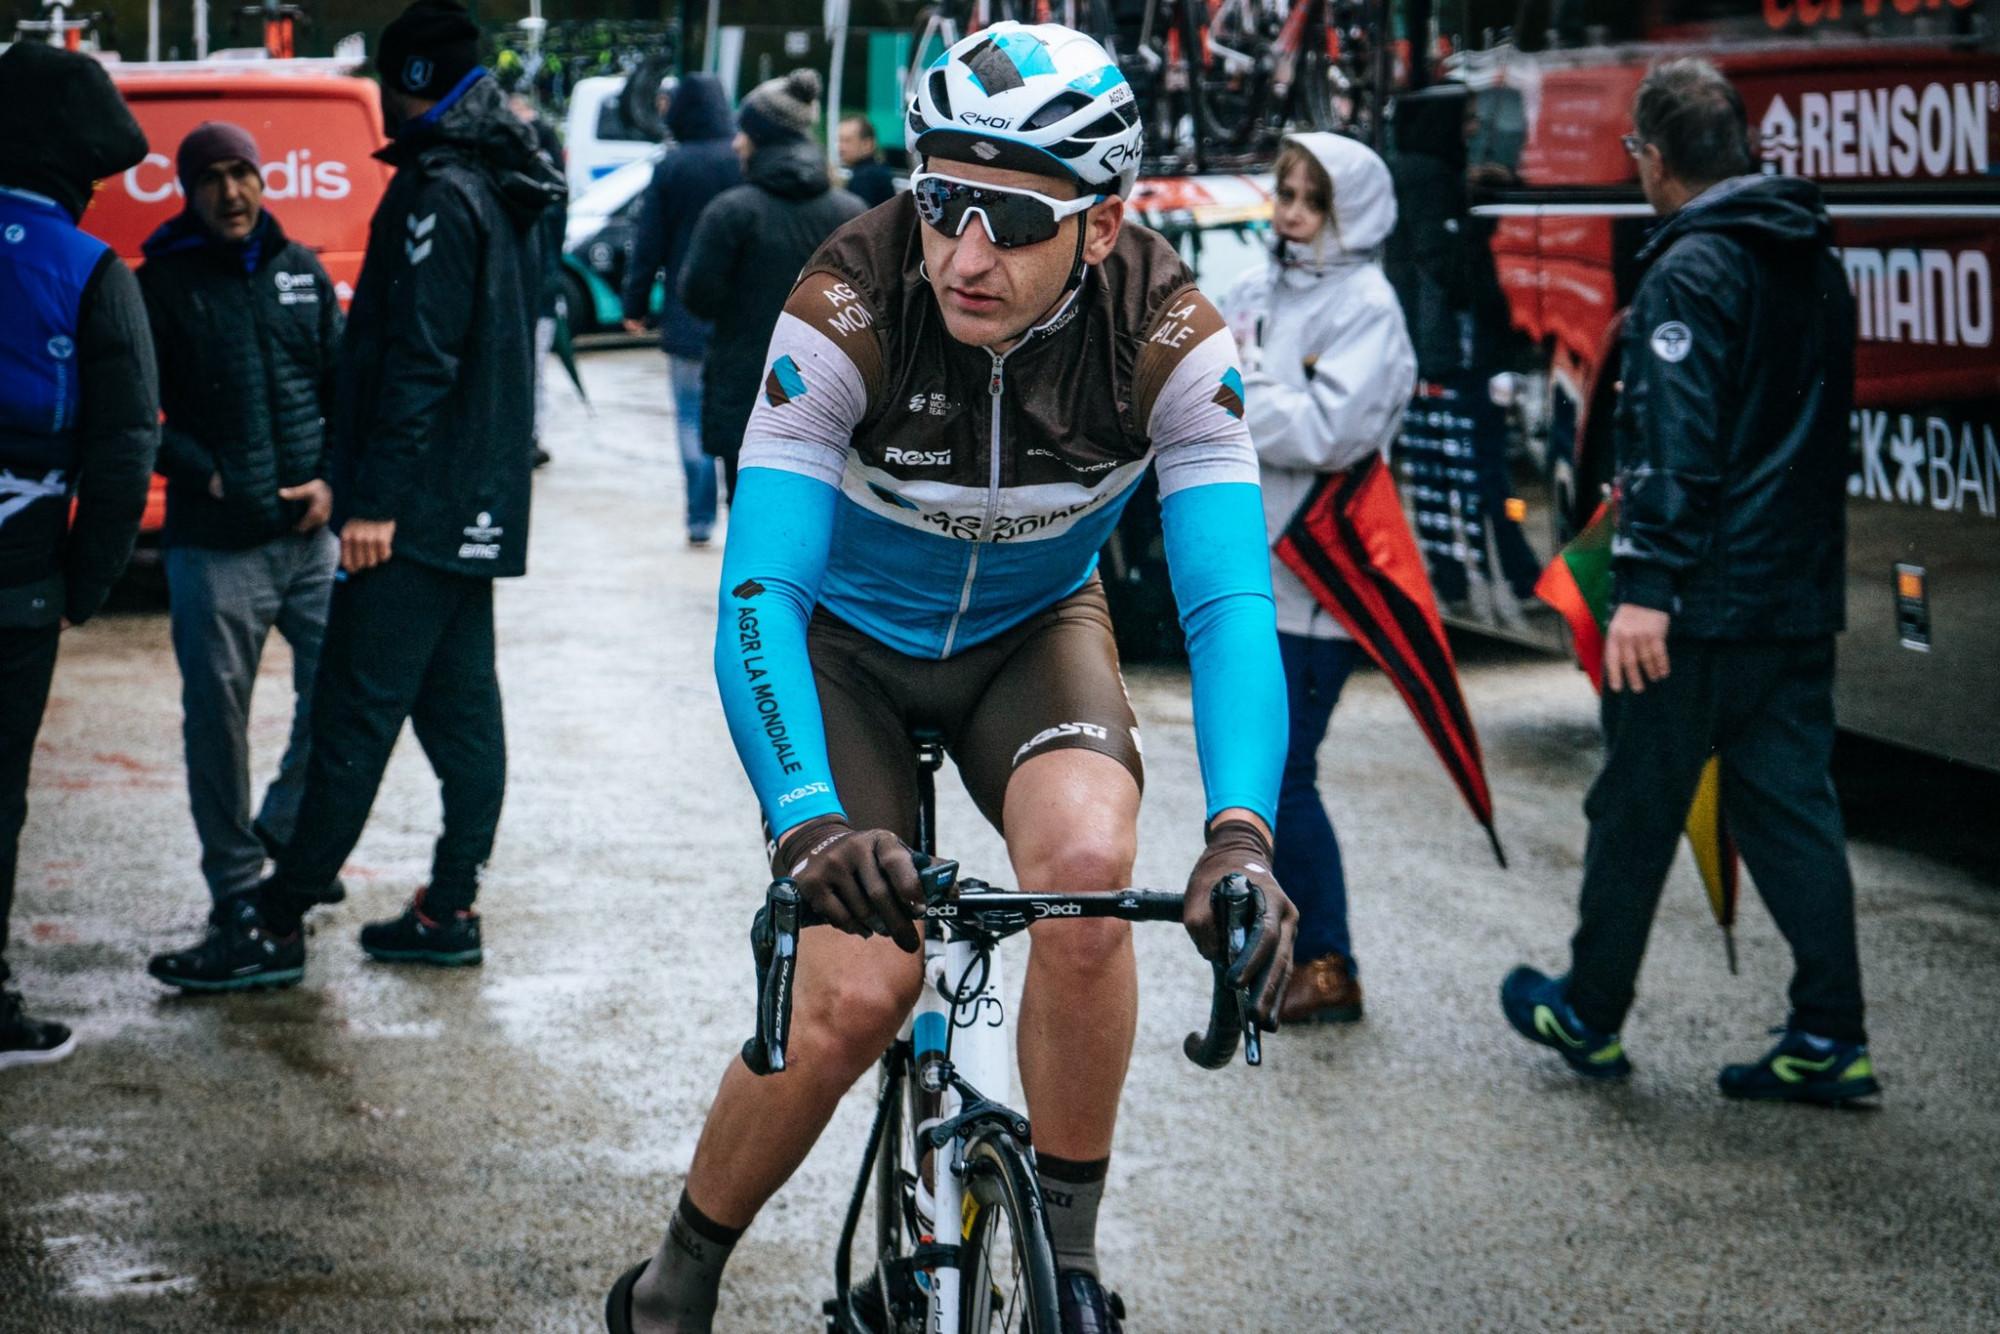 Nans Peters | Paris-Nice - Stage 1